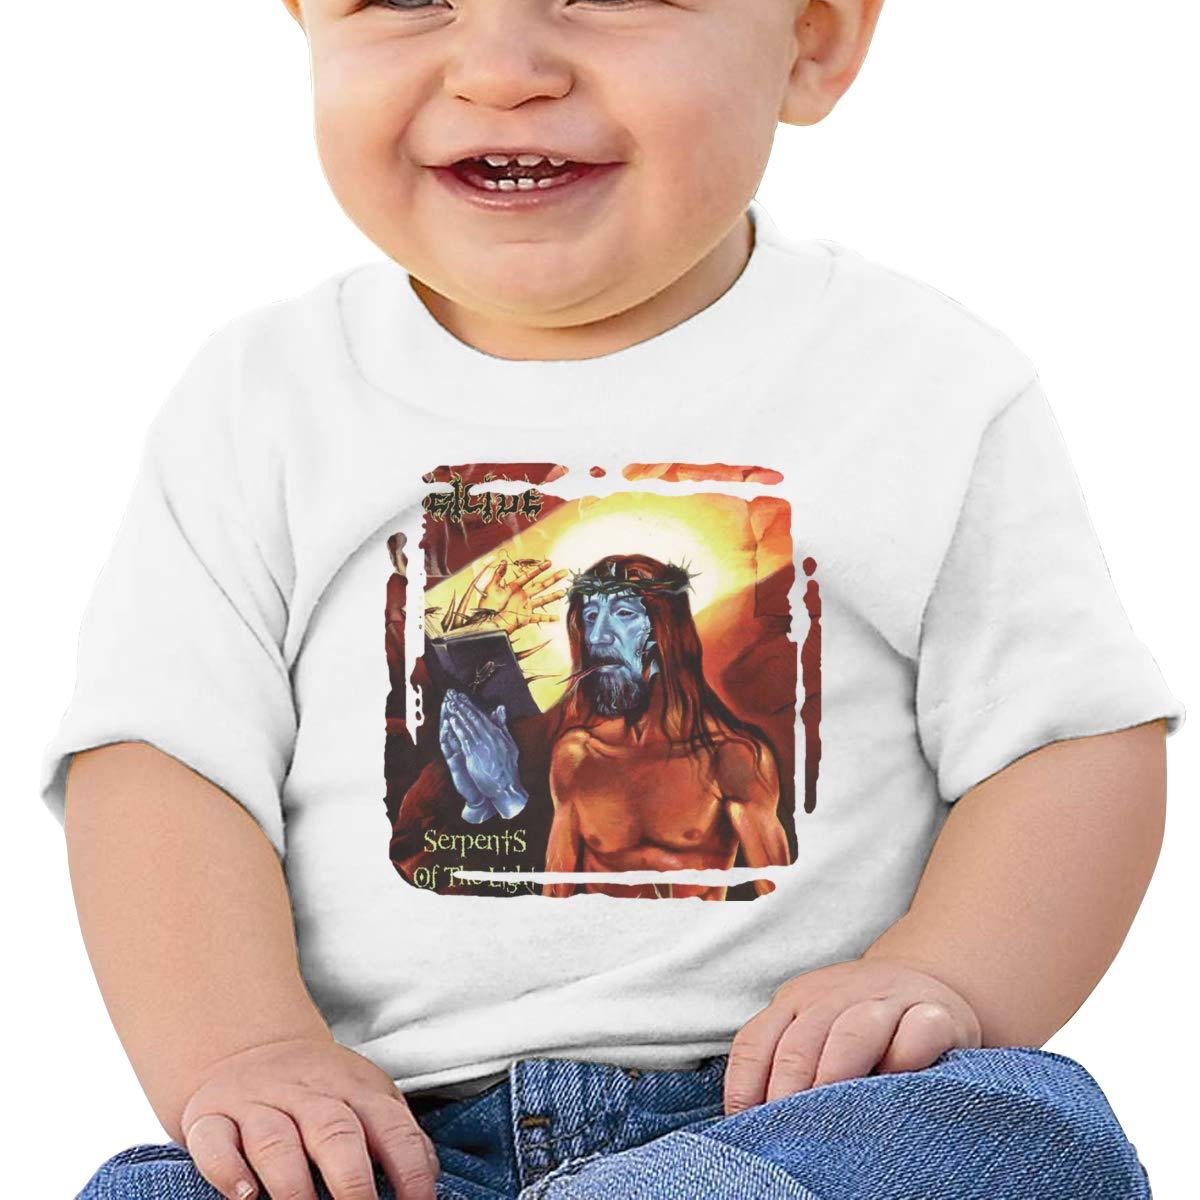 Kangtians Baby Deicide Short Sleeve Shirt Toddler Tee